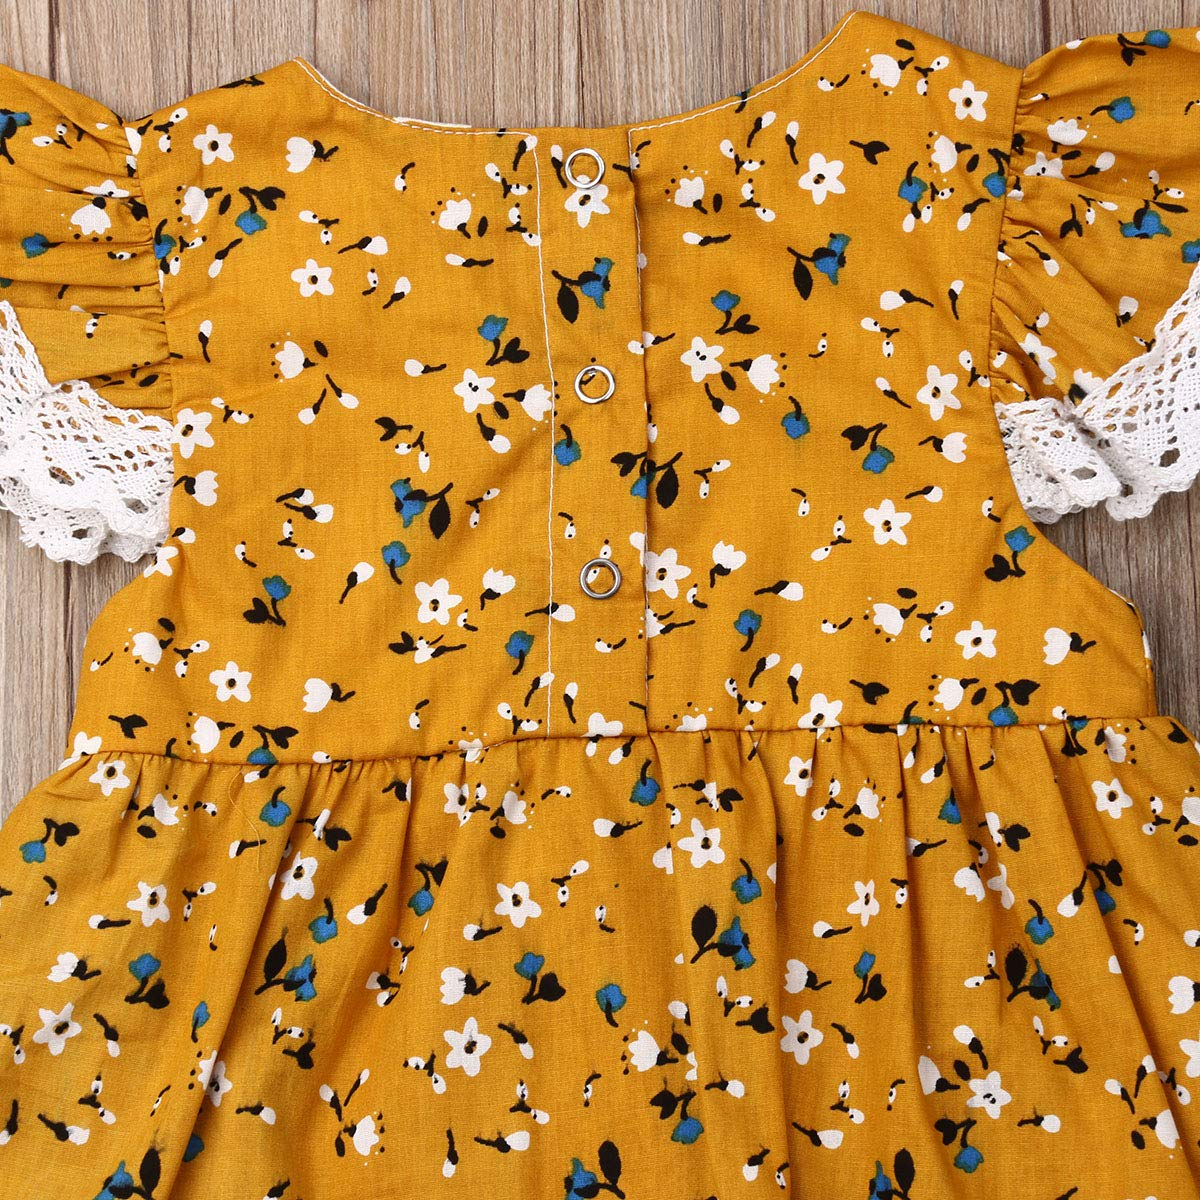 VISGOGO Kids Baby Girls Sister Matching Clothes Floral Romper Dress Headband Outfits Set